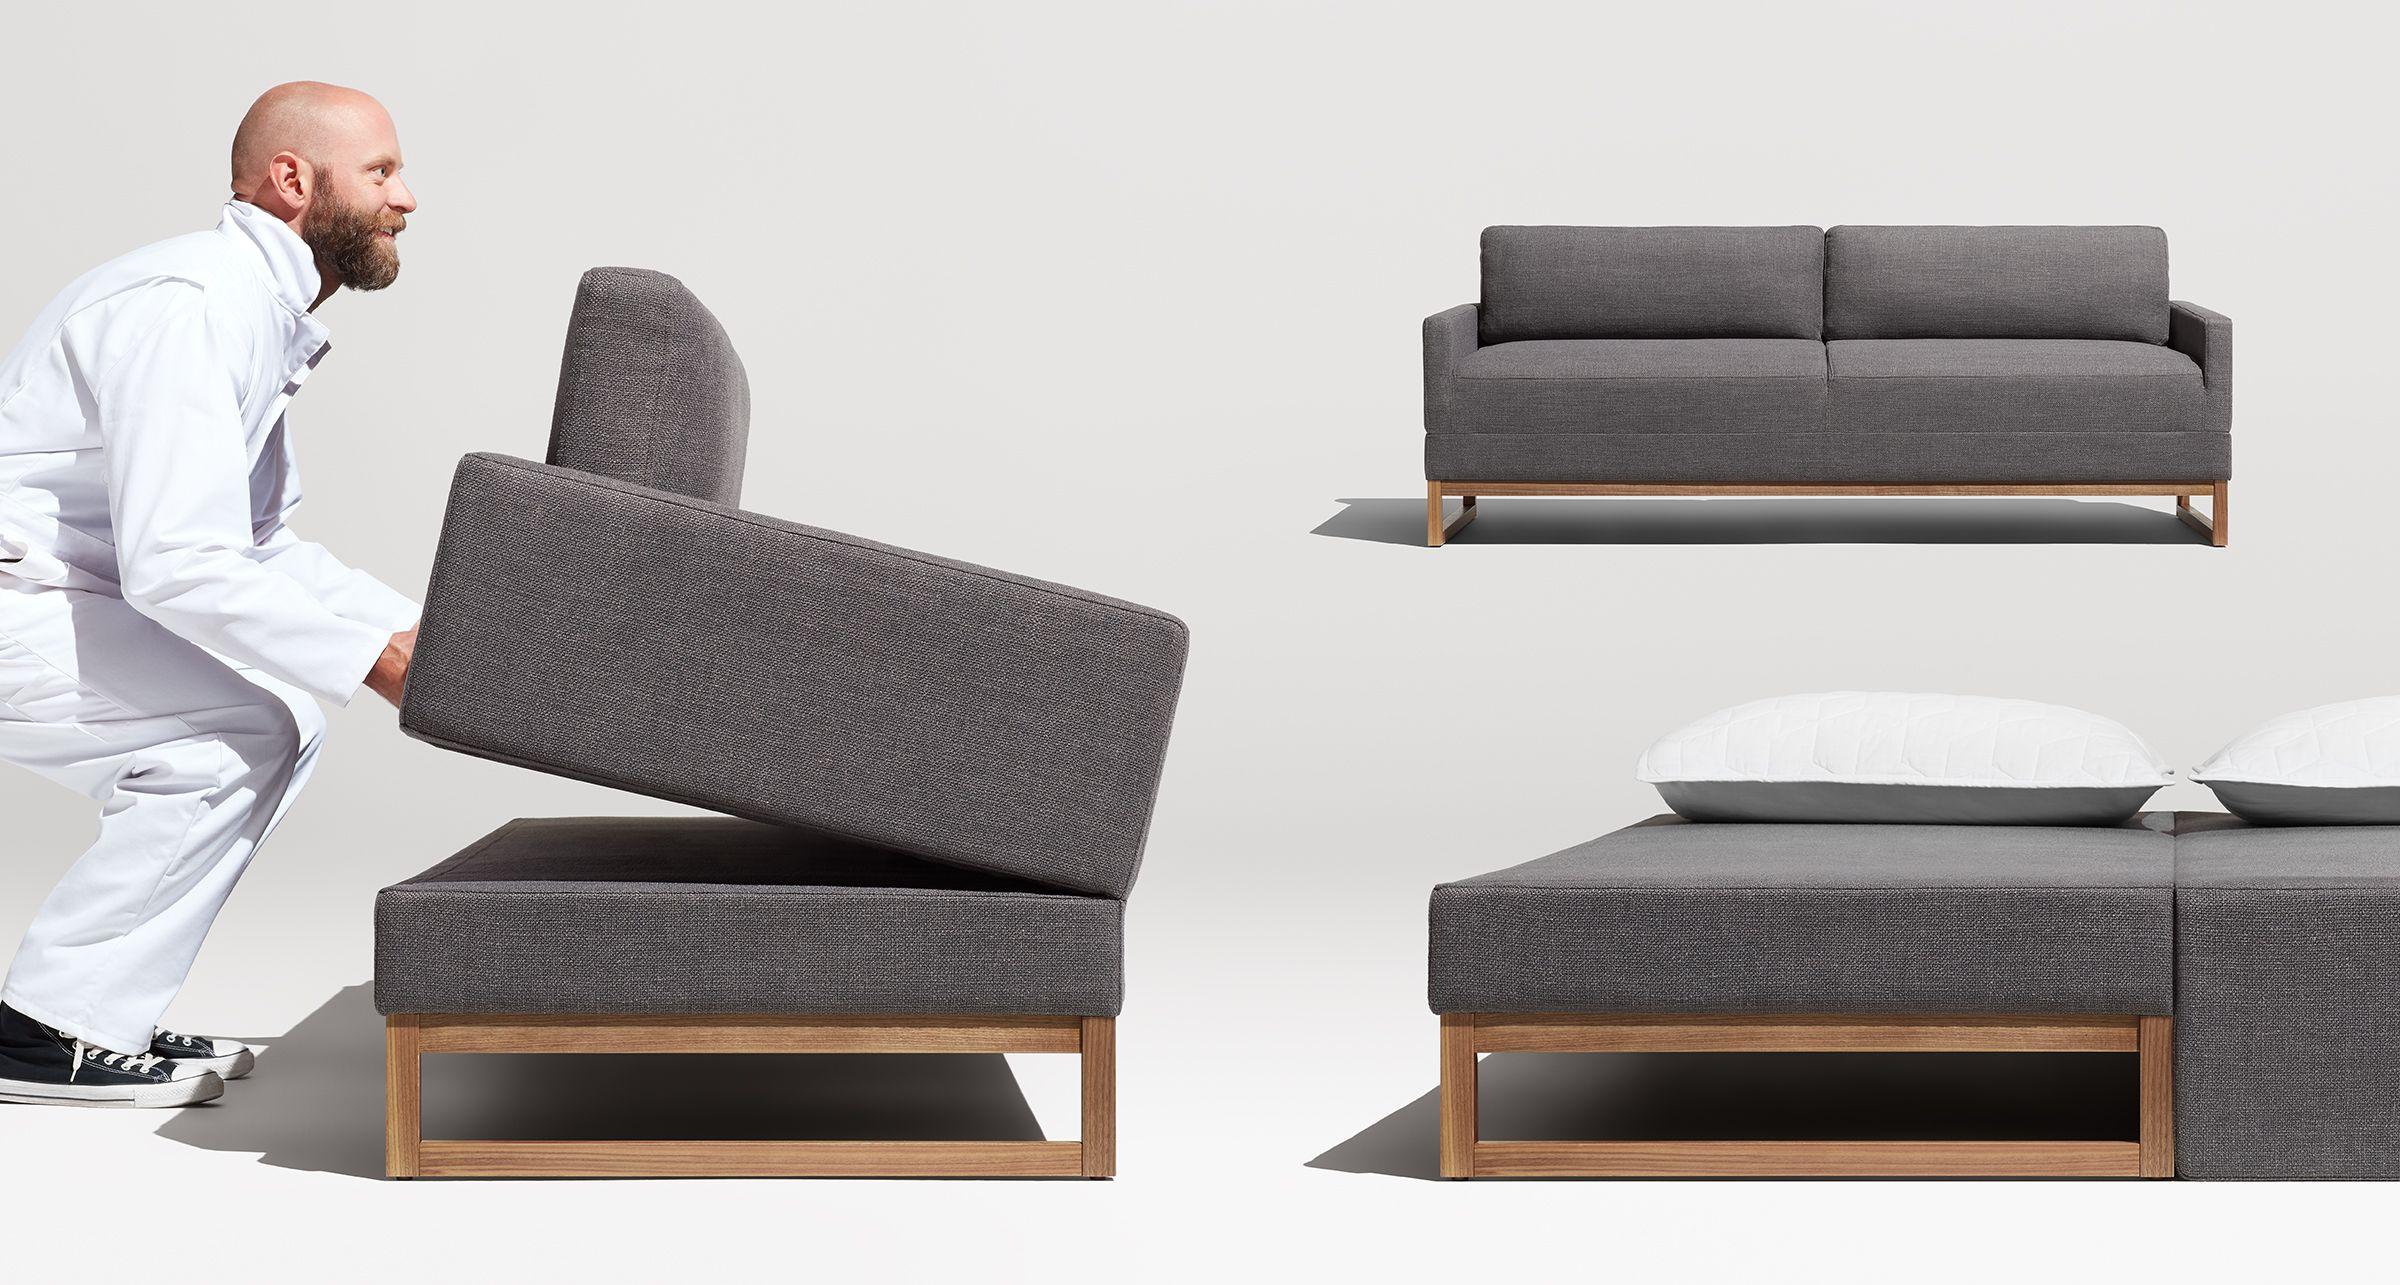 The Best Sofa Bed Sofa Amazing Sofa Bed Sofa 98 Sofa Table Ideas With Sofa Bed Sofa Http Sofacouchs Com Sofa Sofa Bed Design Modern Sleeper Sofa Sofa Bed